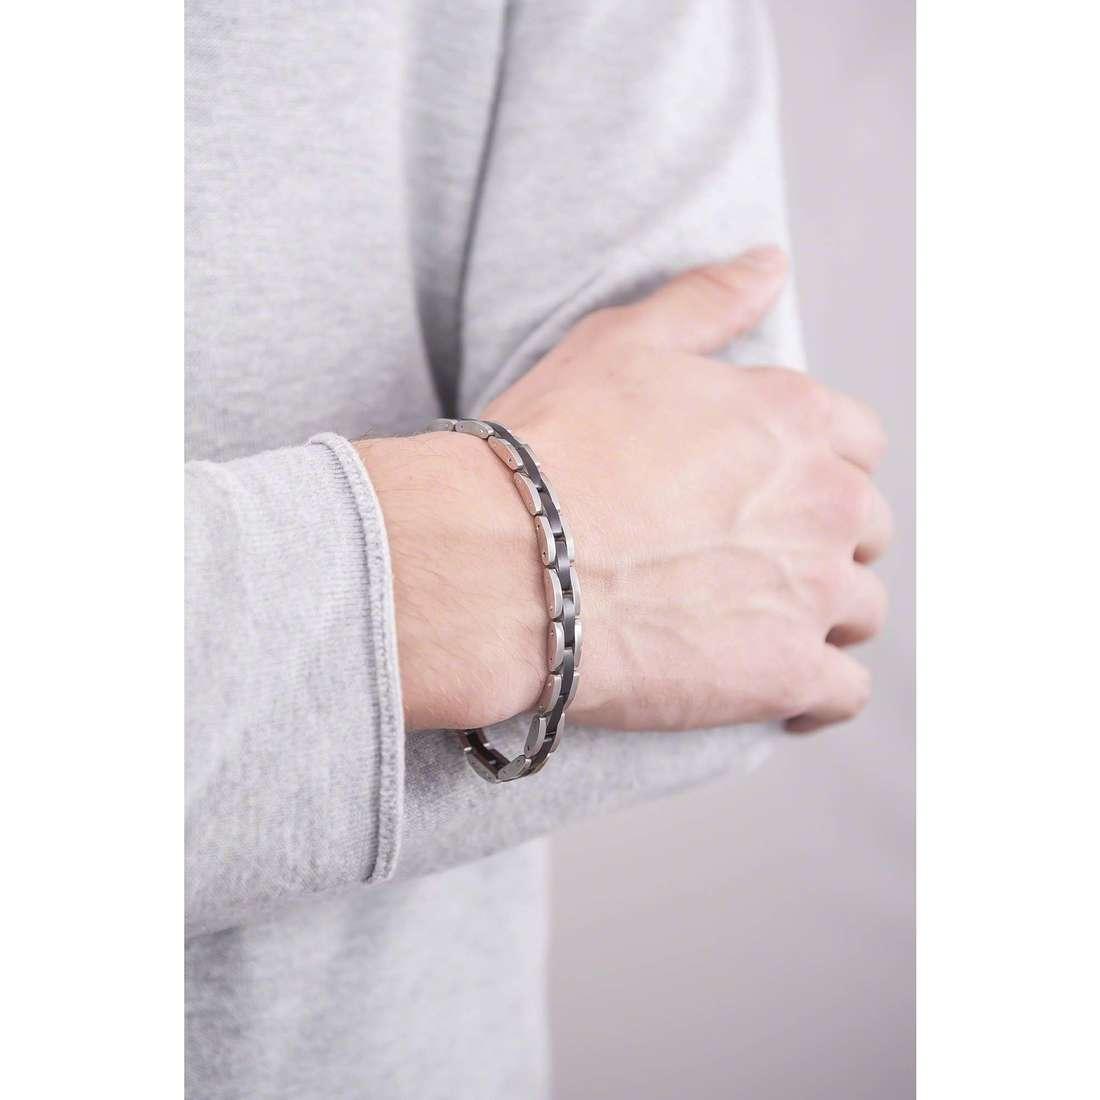 4US Cesare Paciotti bracciali uomo 4UBR1372 indosso